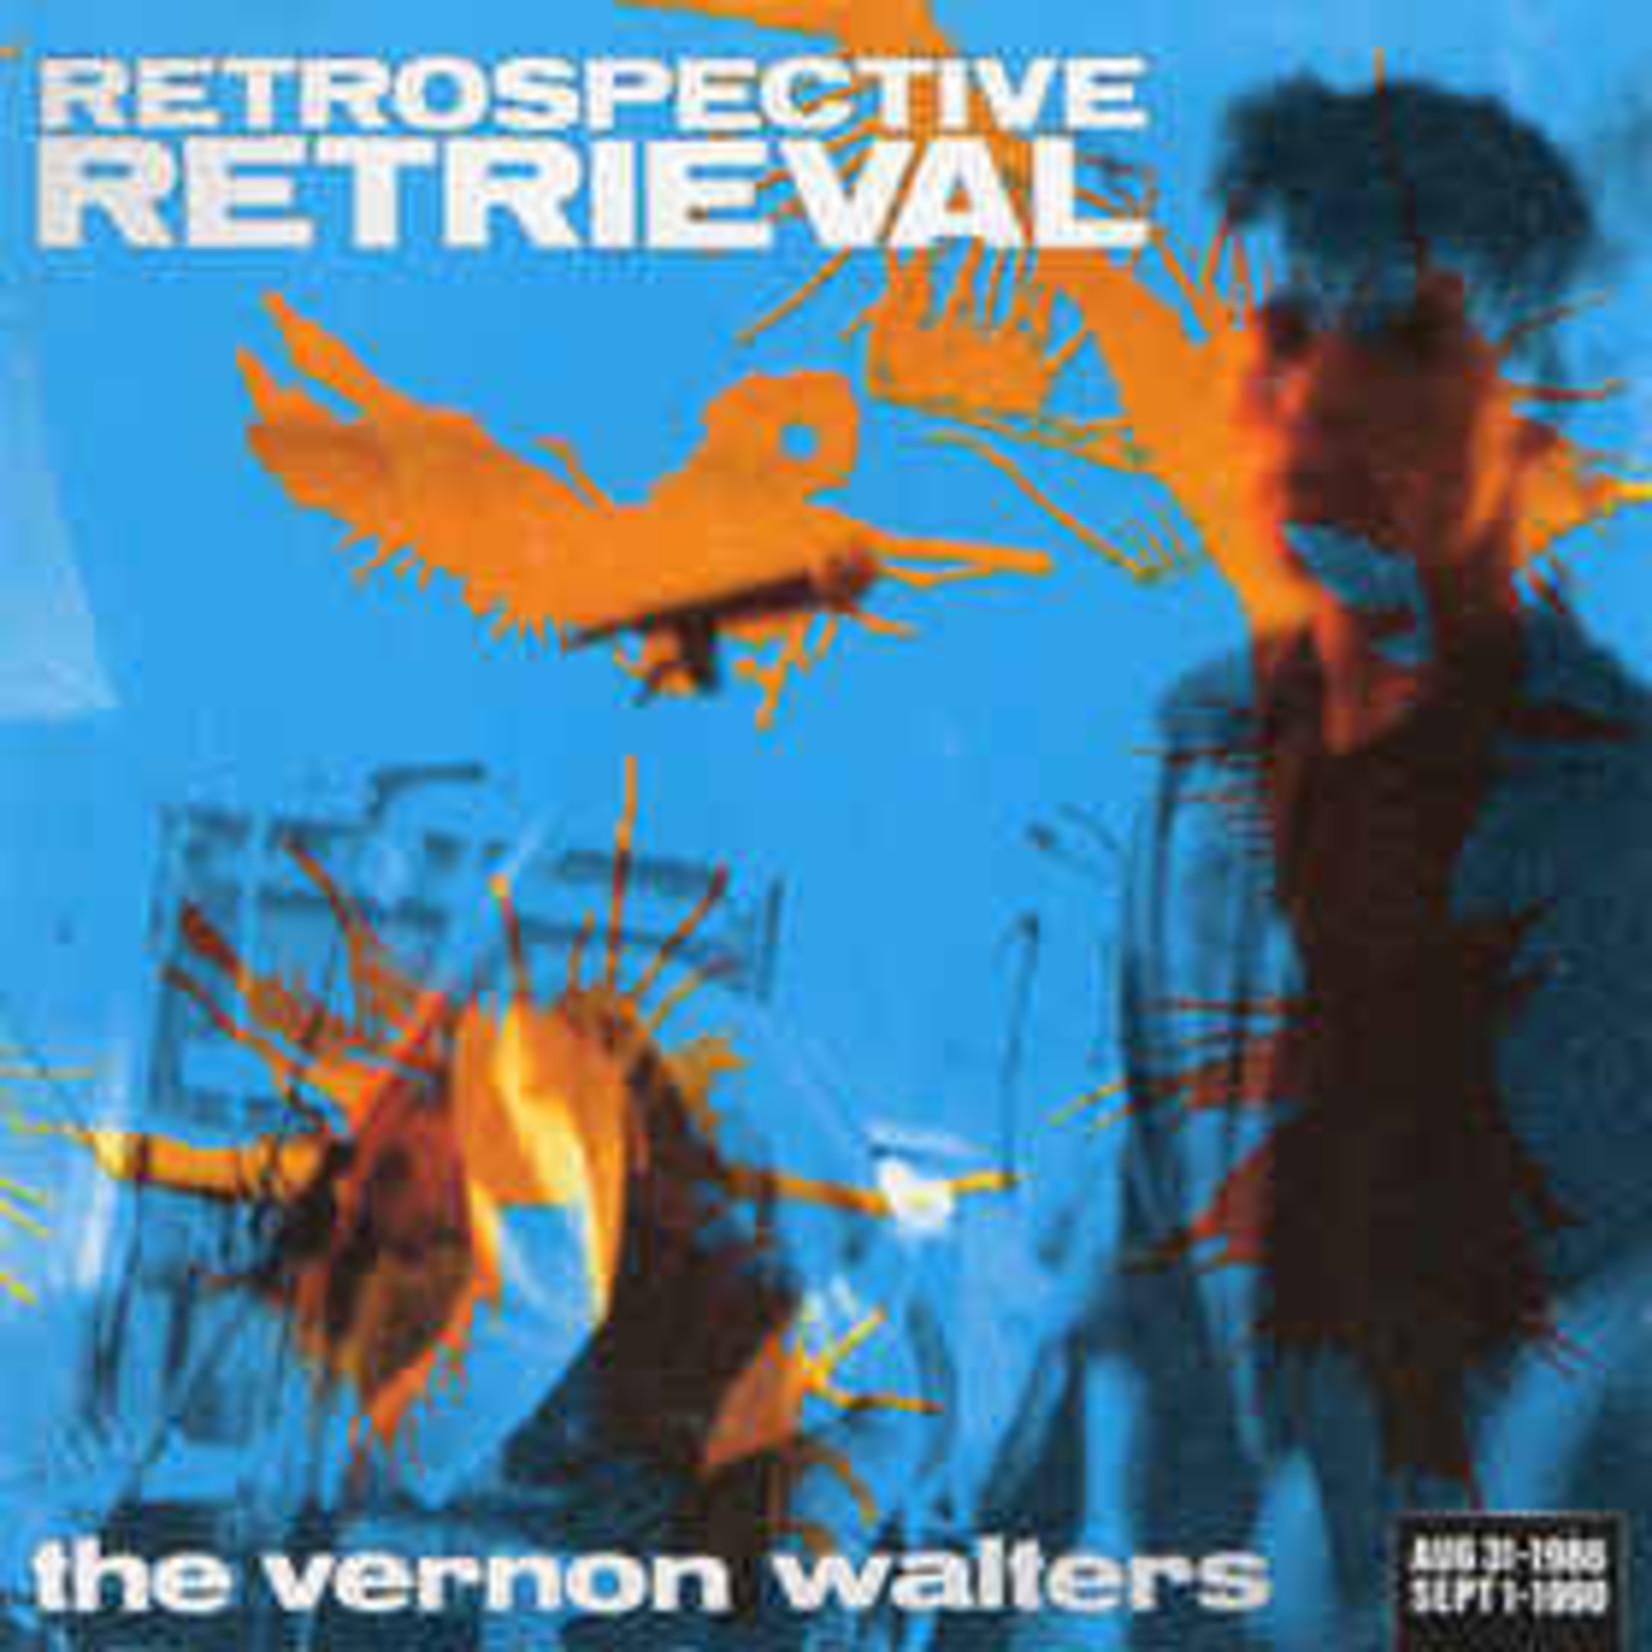 The Vernon Walters – Retrospective Retrieval